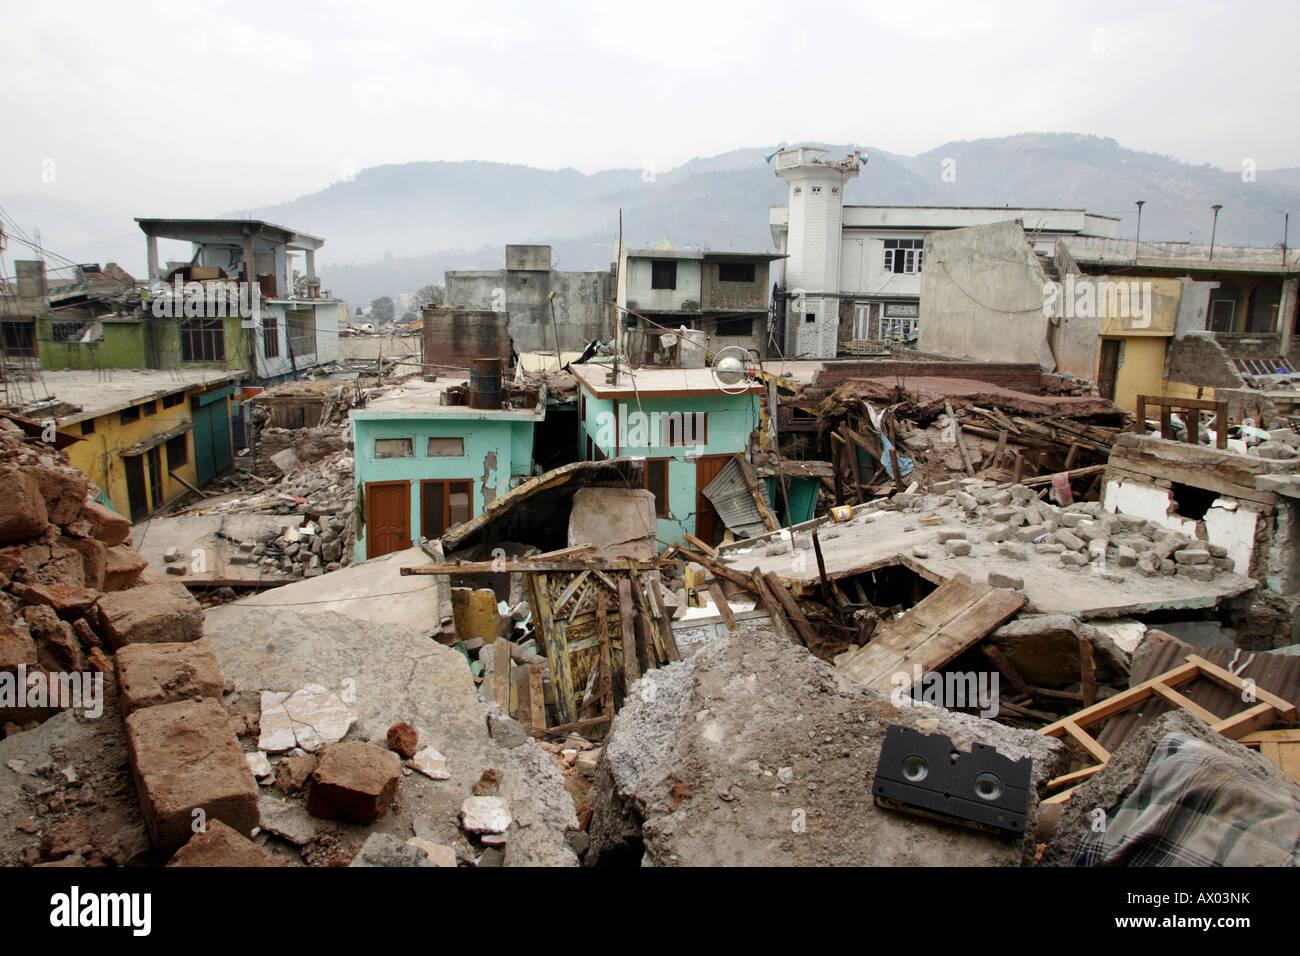 Muzaffarabad devastated by an earthquake, Pakistan - Stock Image